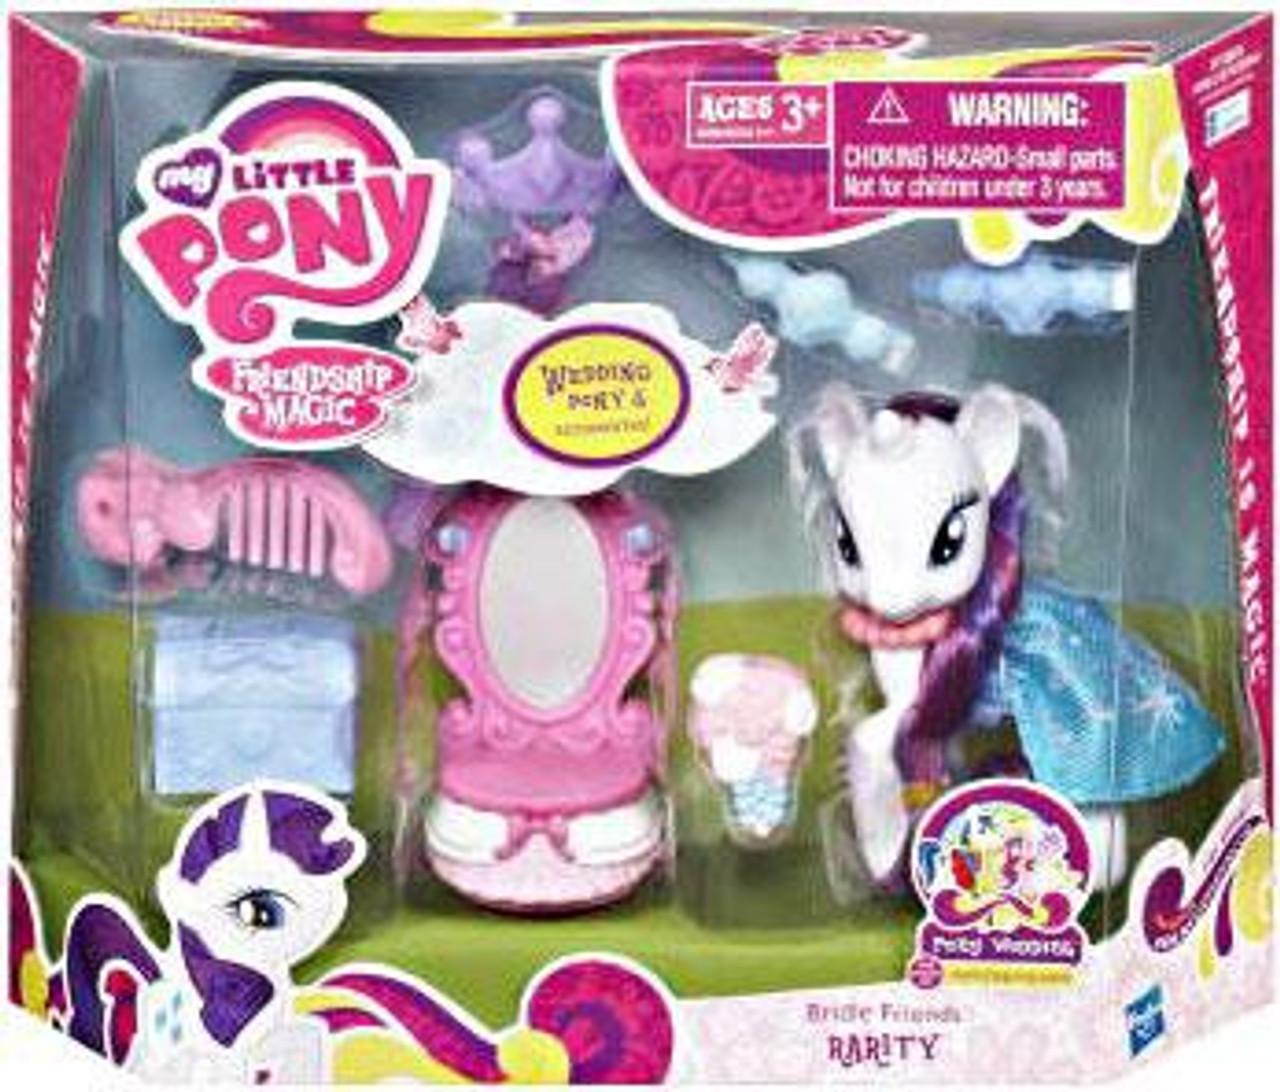 My Little Pony Friendship is Magic Pony Wedding Bridle Friends Rarity Figure Set